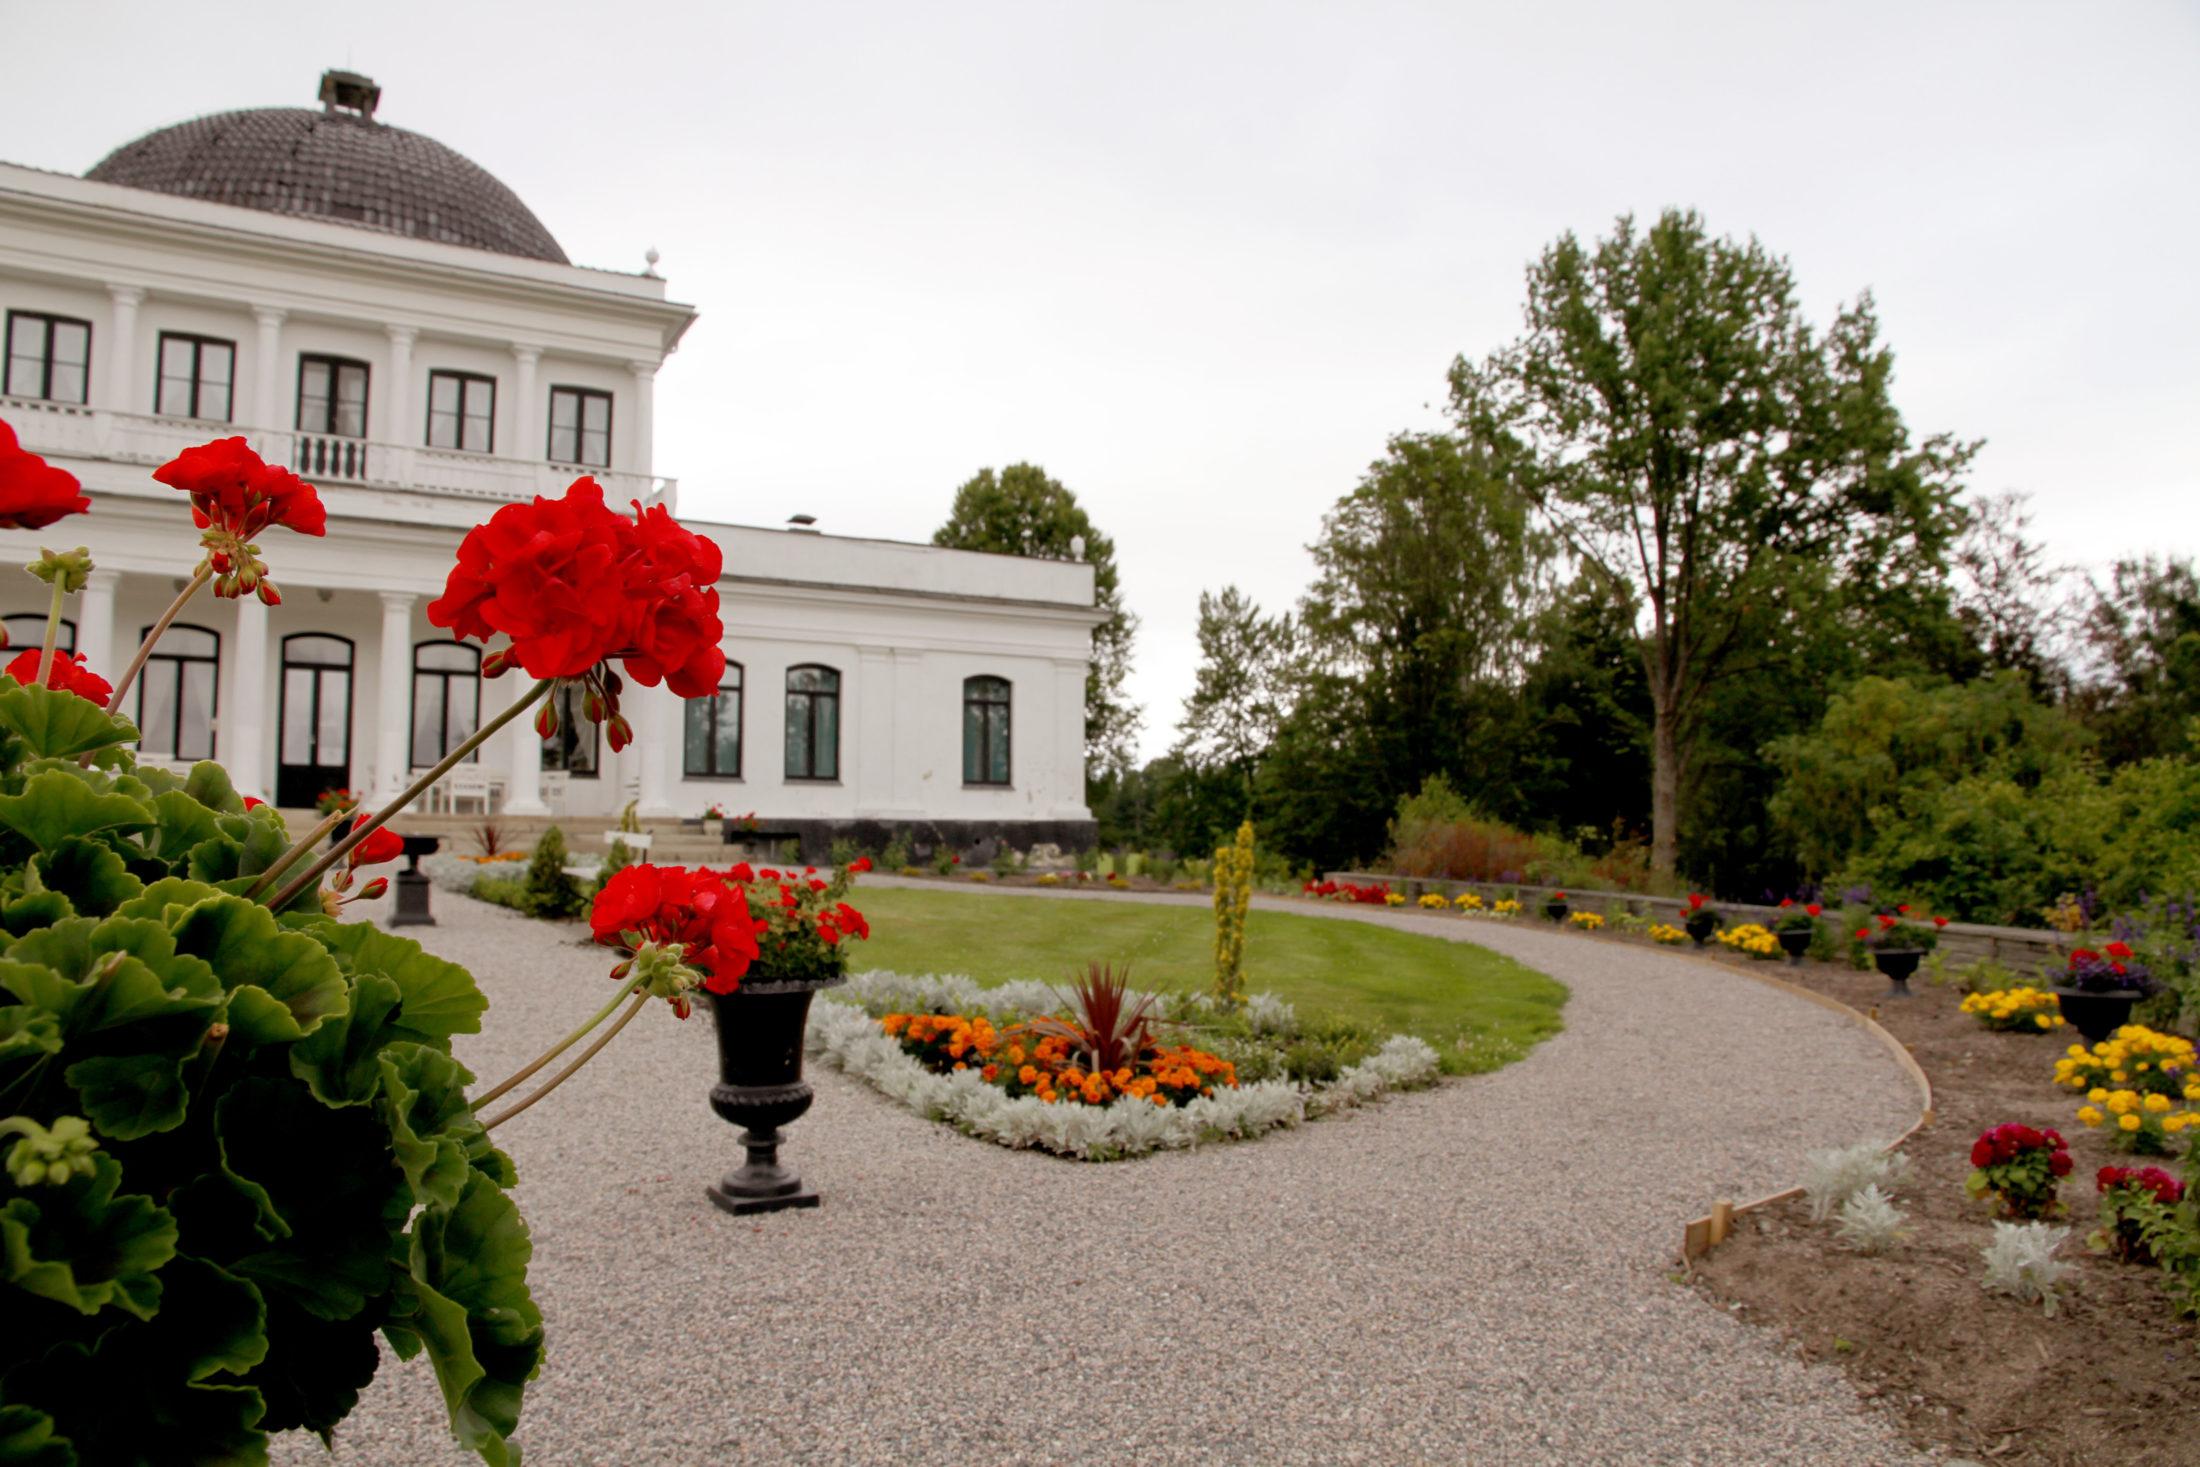 Ulefos Hovedgaard - grønn glede - foto Telemark museum